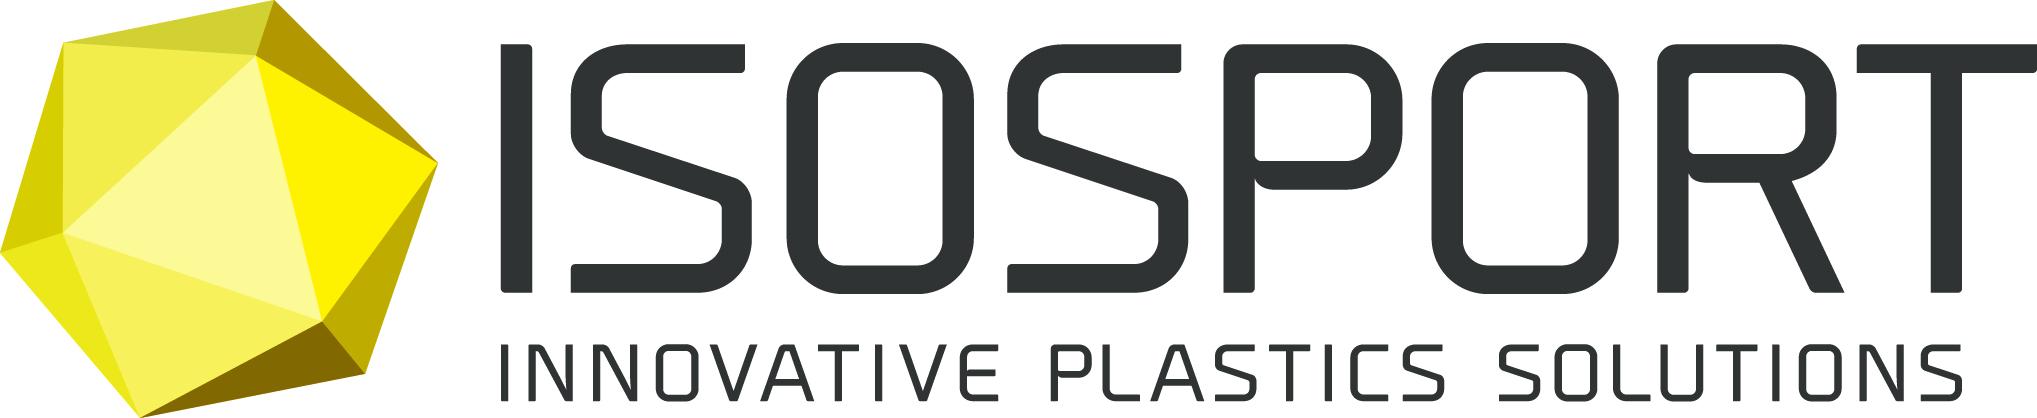 Logo Isosport